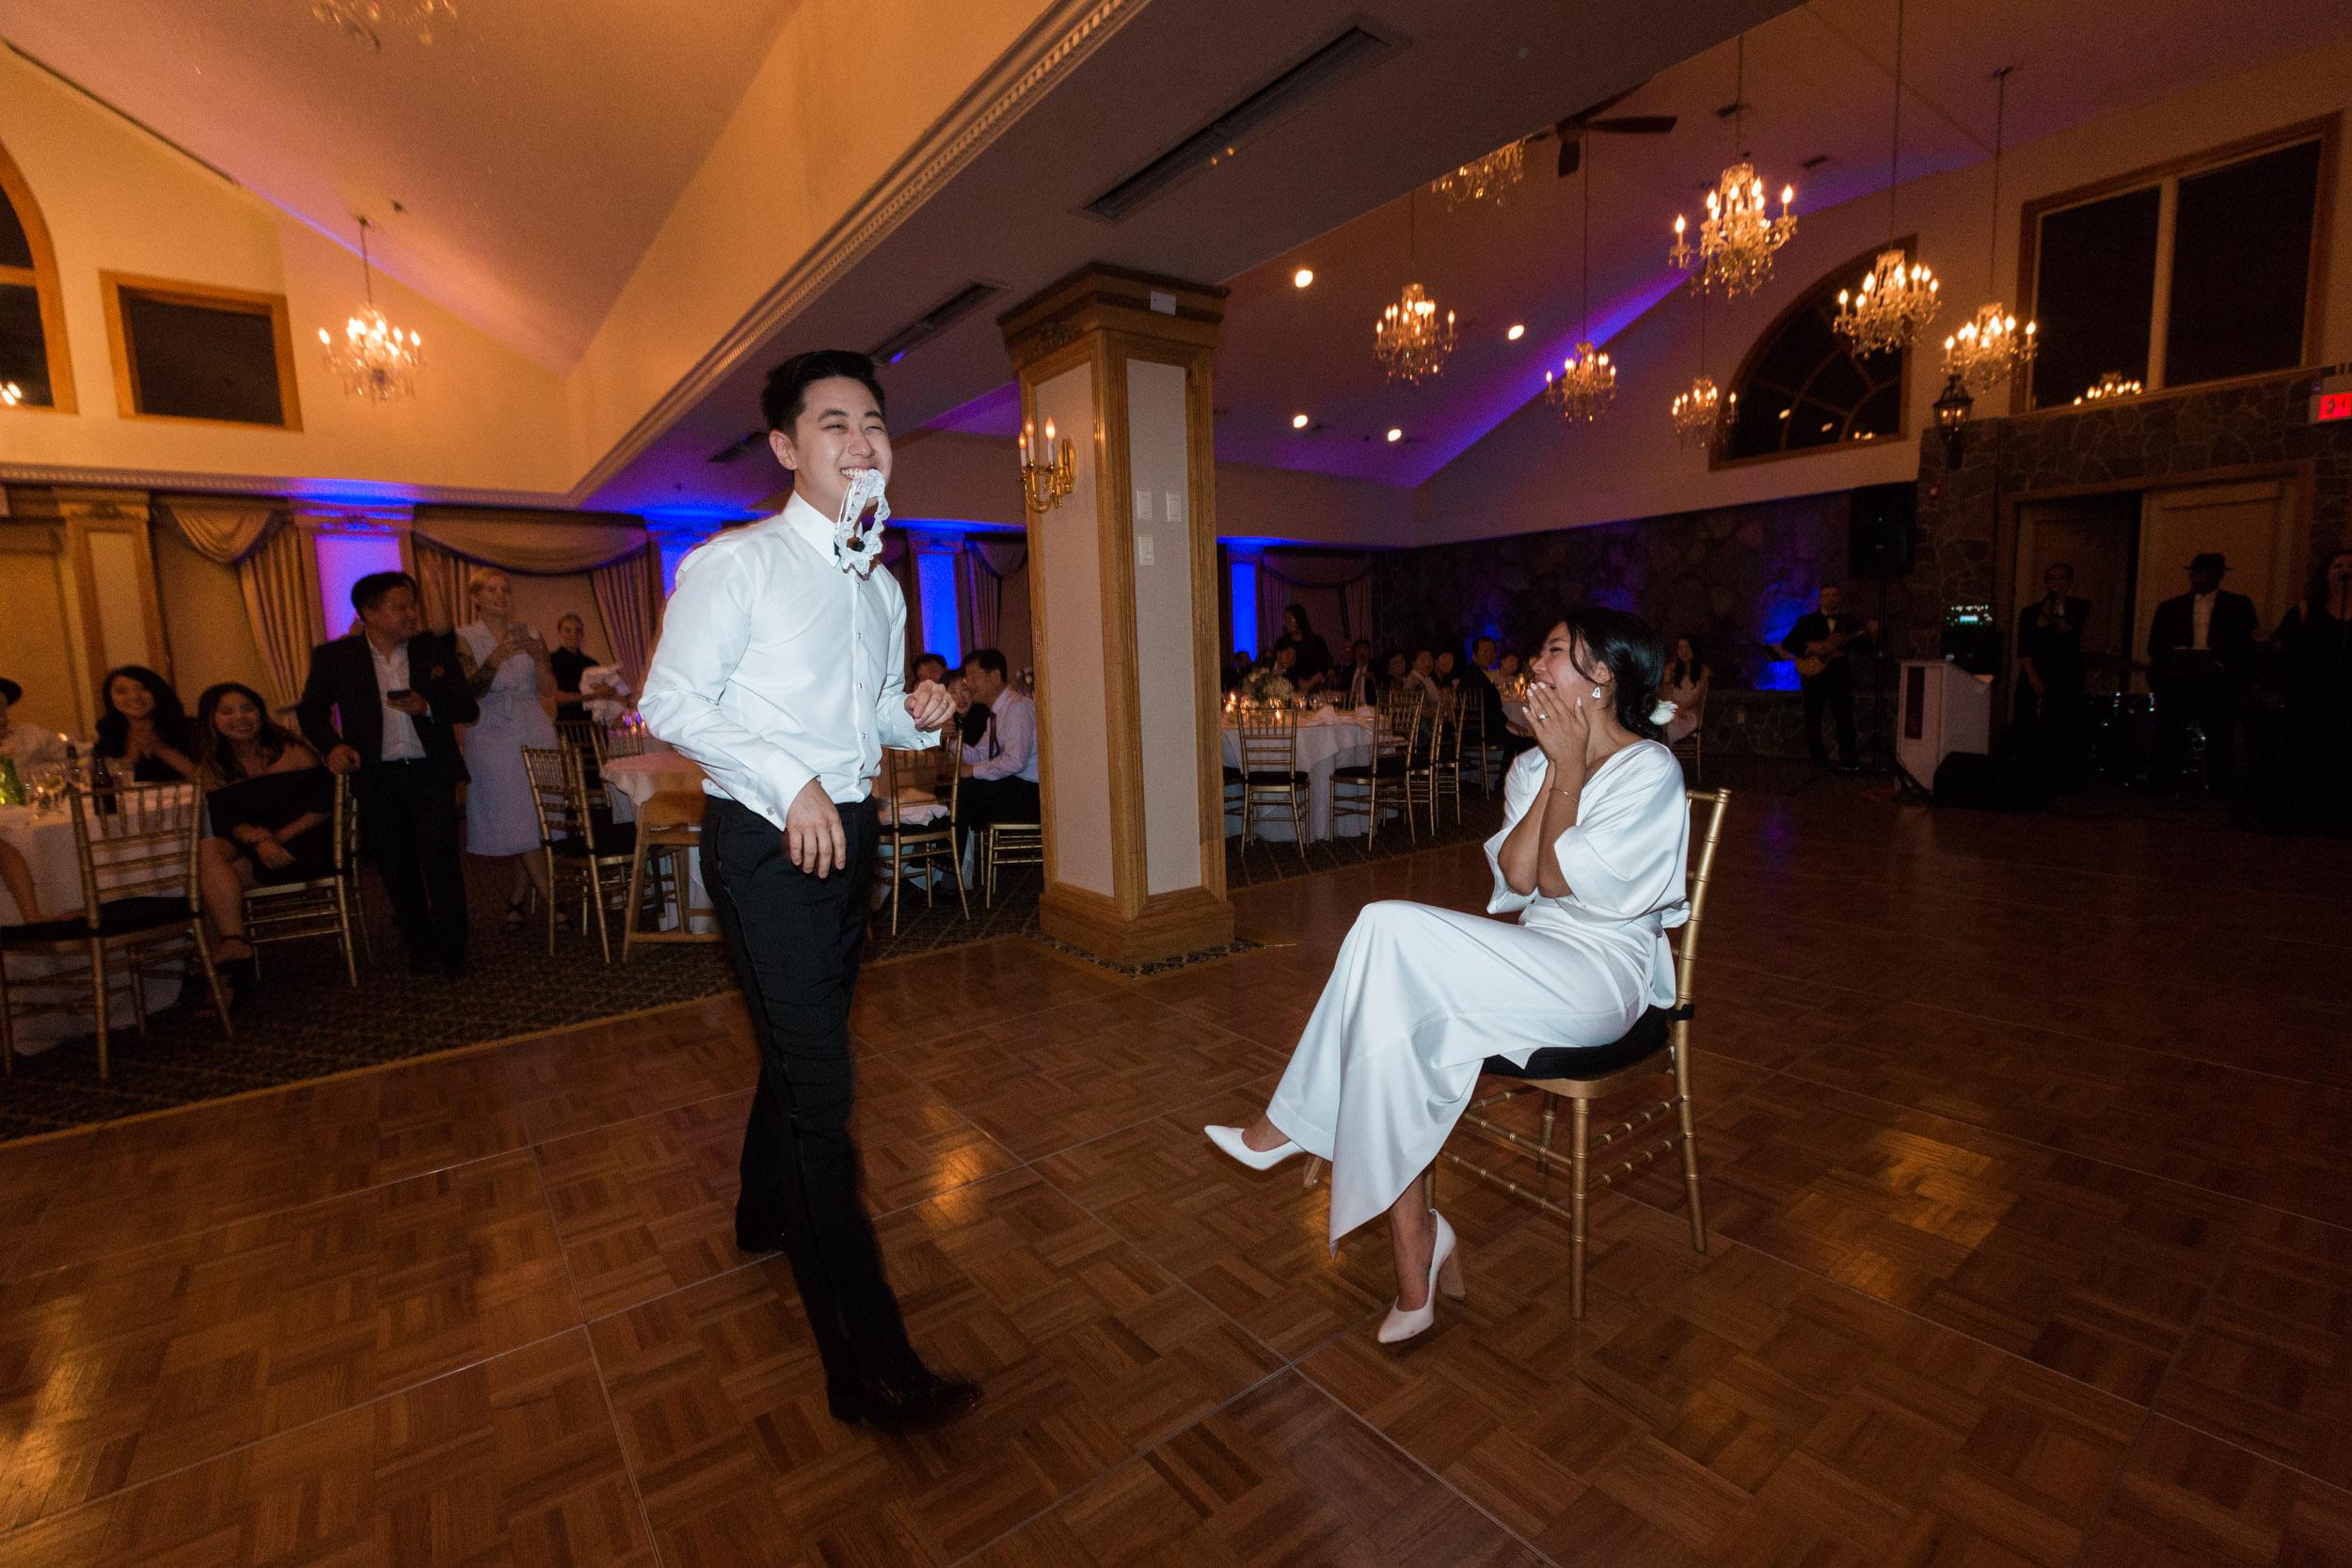 jean-arnold-wedding-0060.jpg